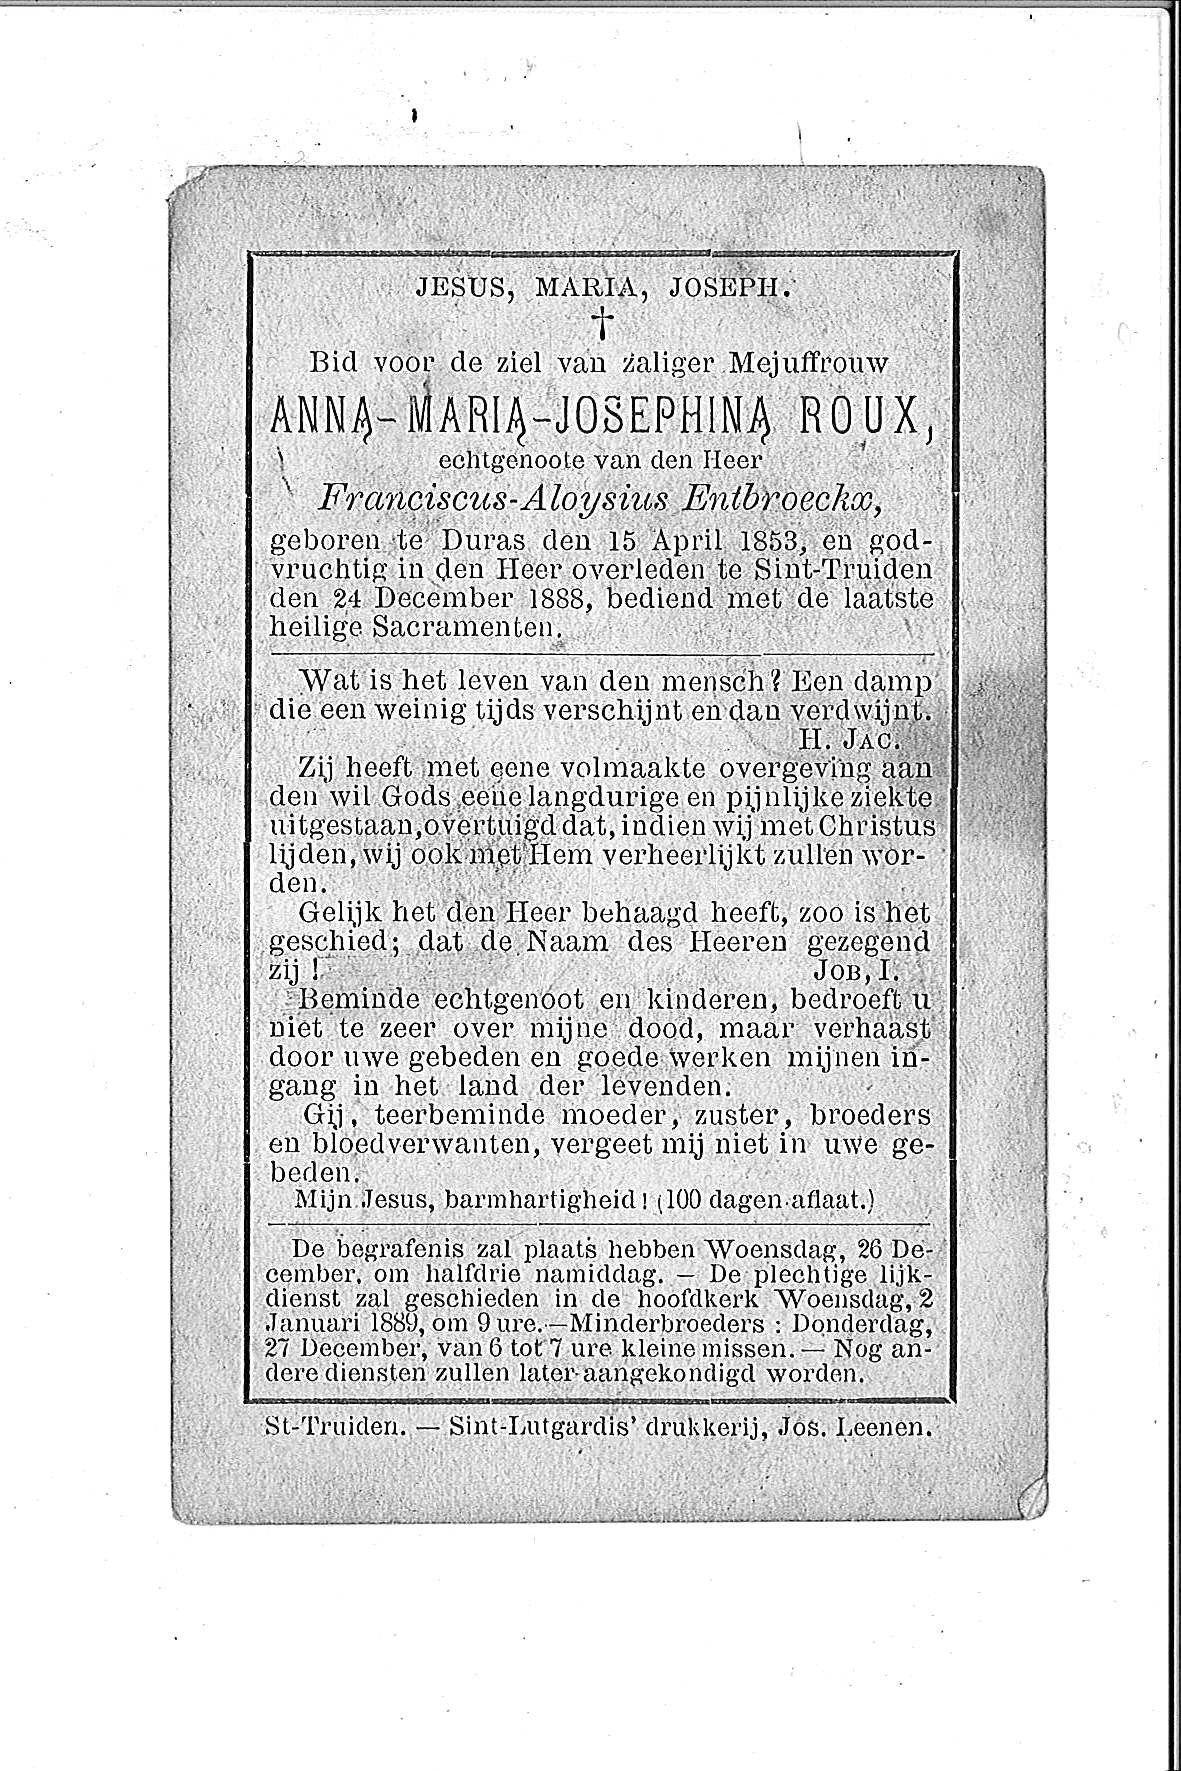 Anna-Maria-Josephina(1888)20150106152215_00059.jpg